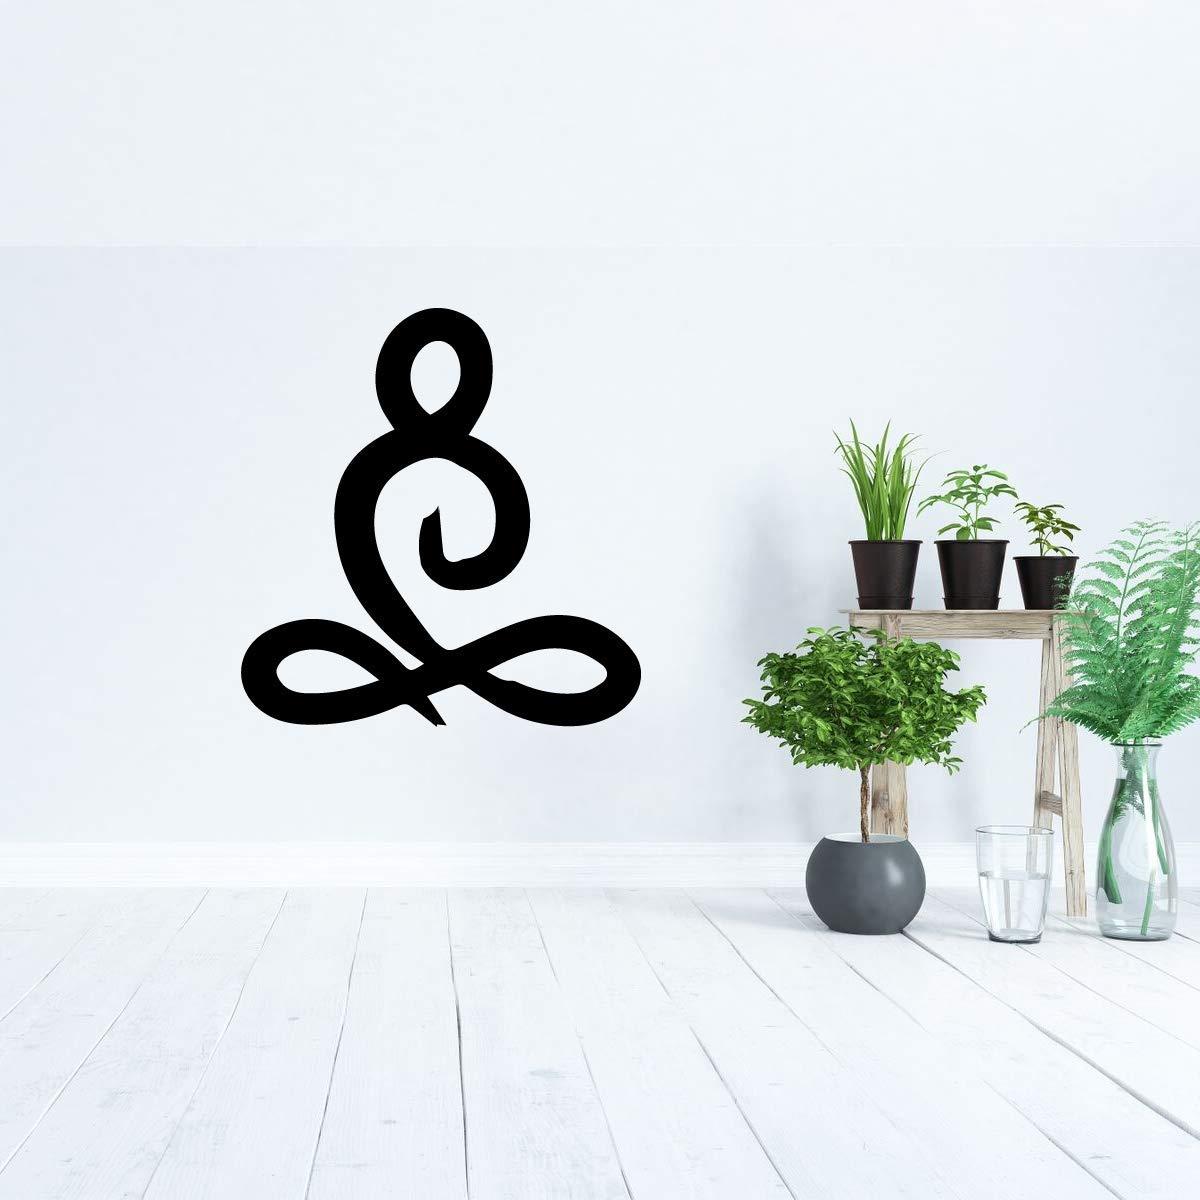 Yoga Room Decor Vinyl Wall Decal   Yogi Meditation Decoration for Living Room, Bedroom at Home or Fitness Studio